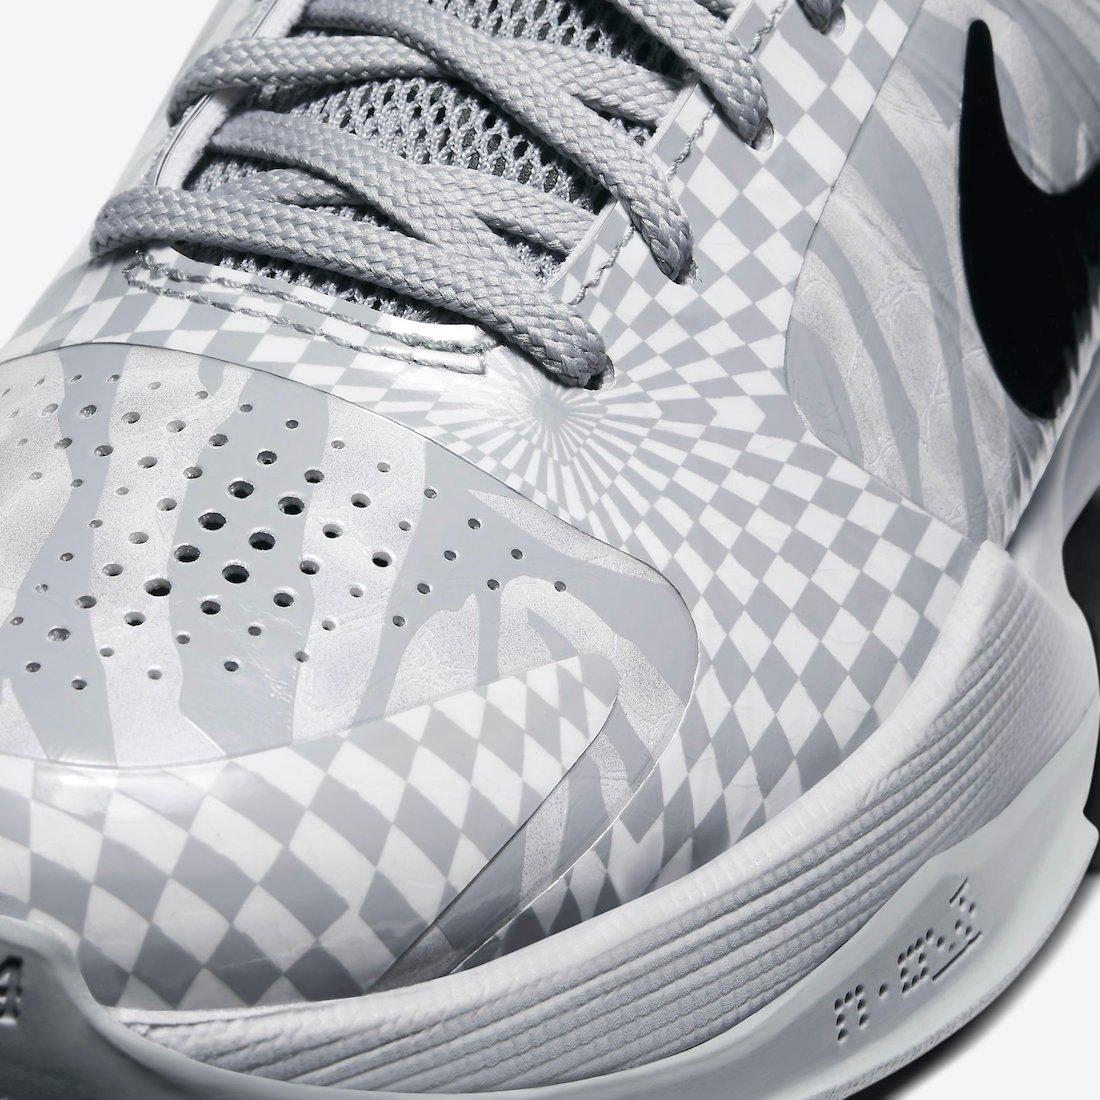 DeMar DeRozan Nike Kobe 5 Protro Zebra CD4991-003 Release Date